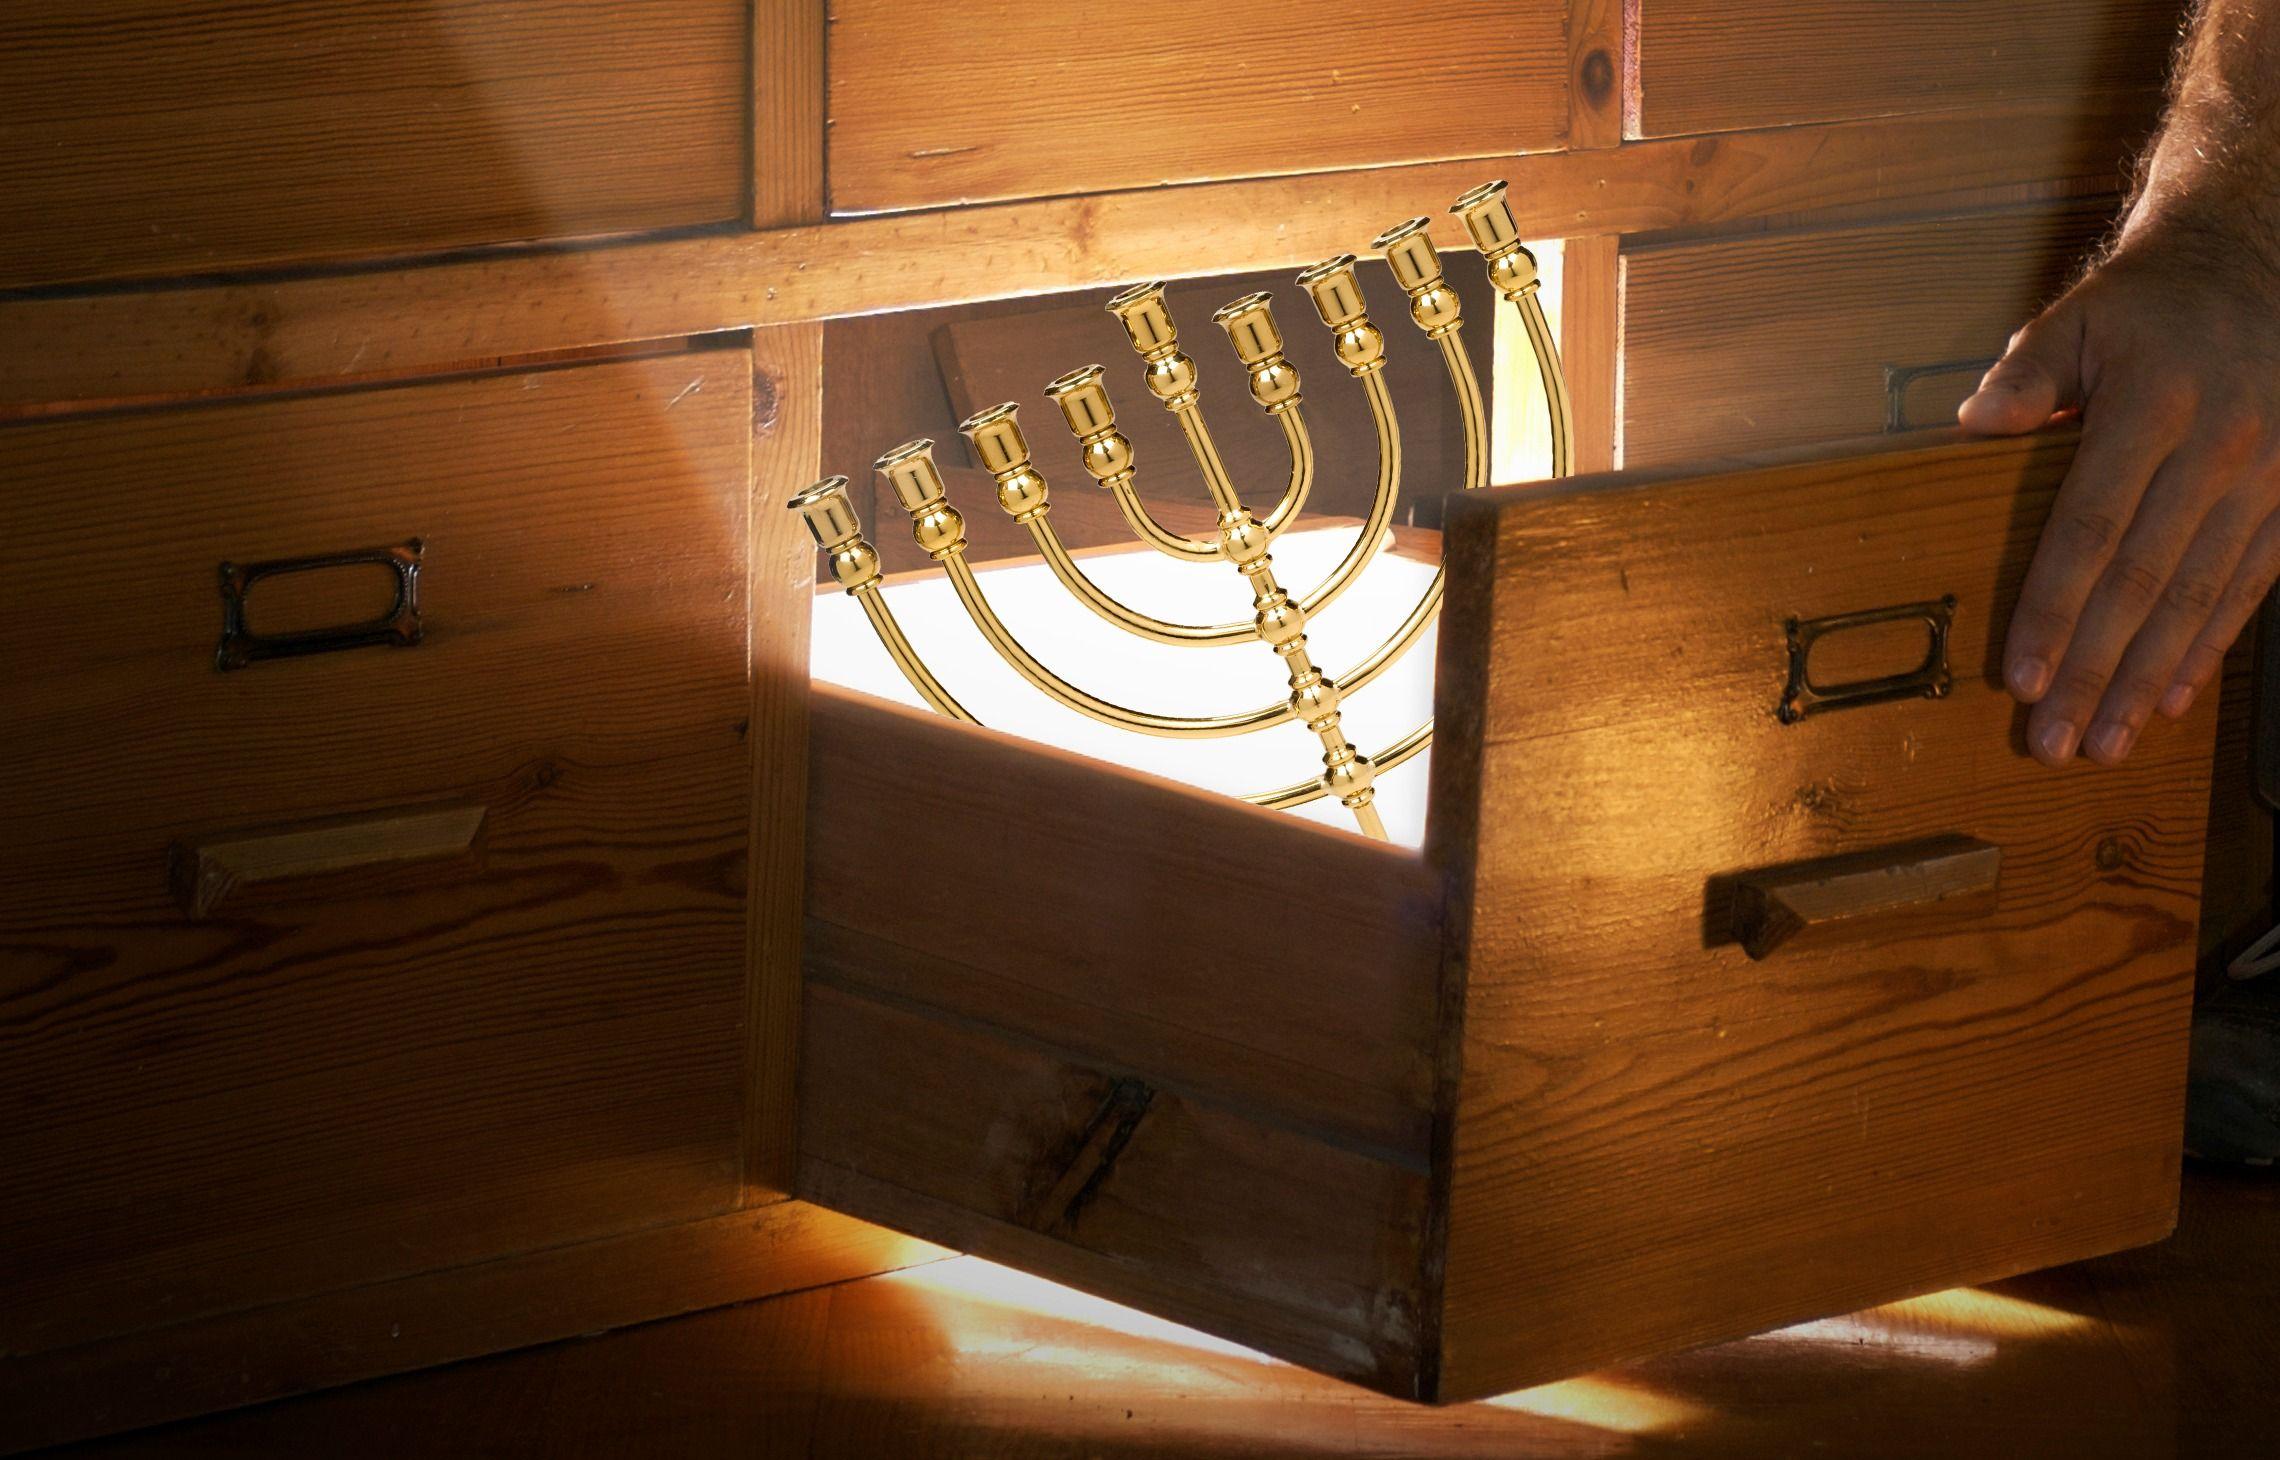 Alexandria Ocasio-Cortez Stokes Controversy With Claim Of Sephardic Ancestry